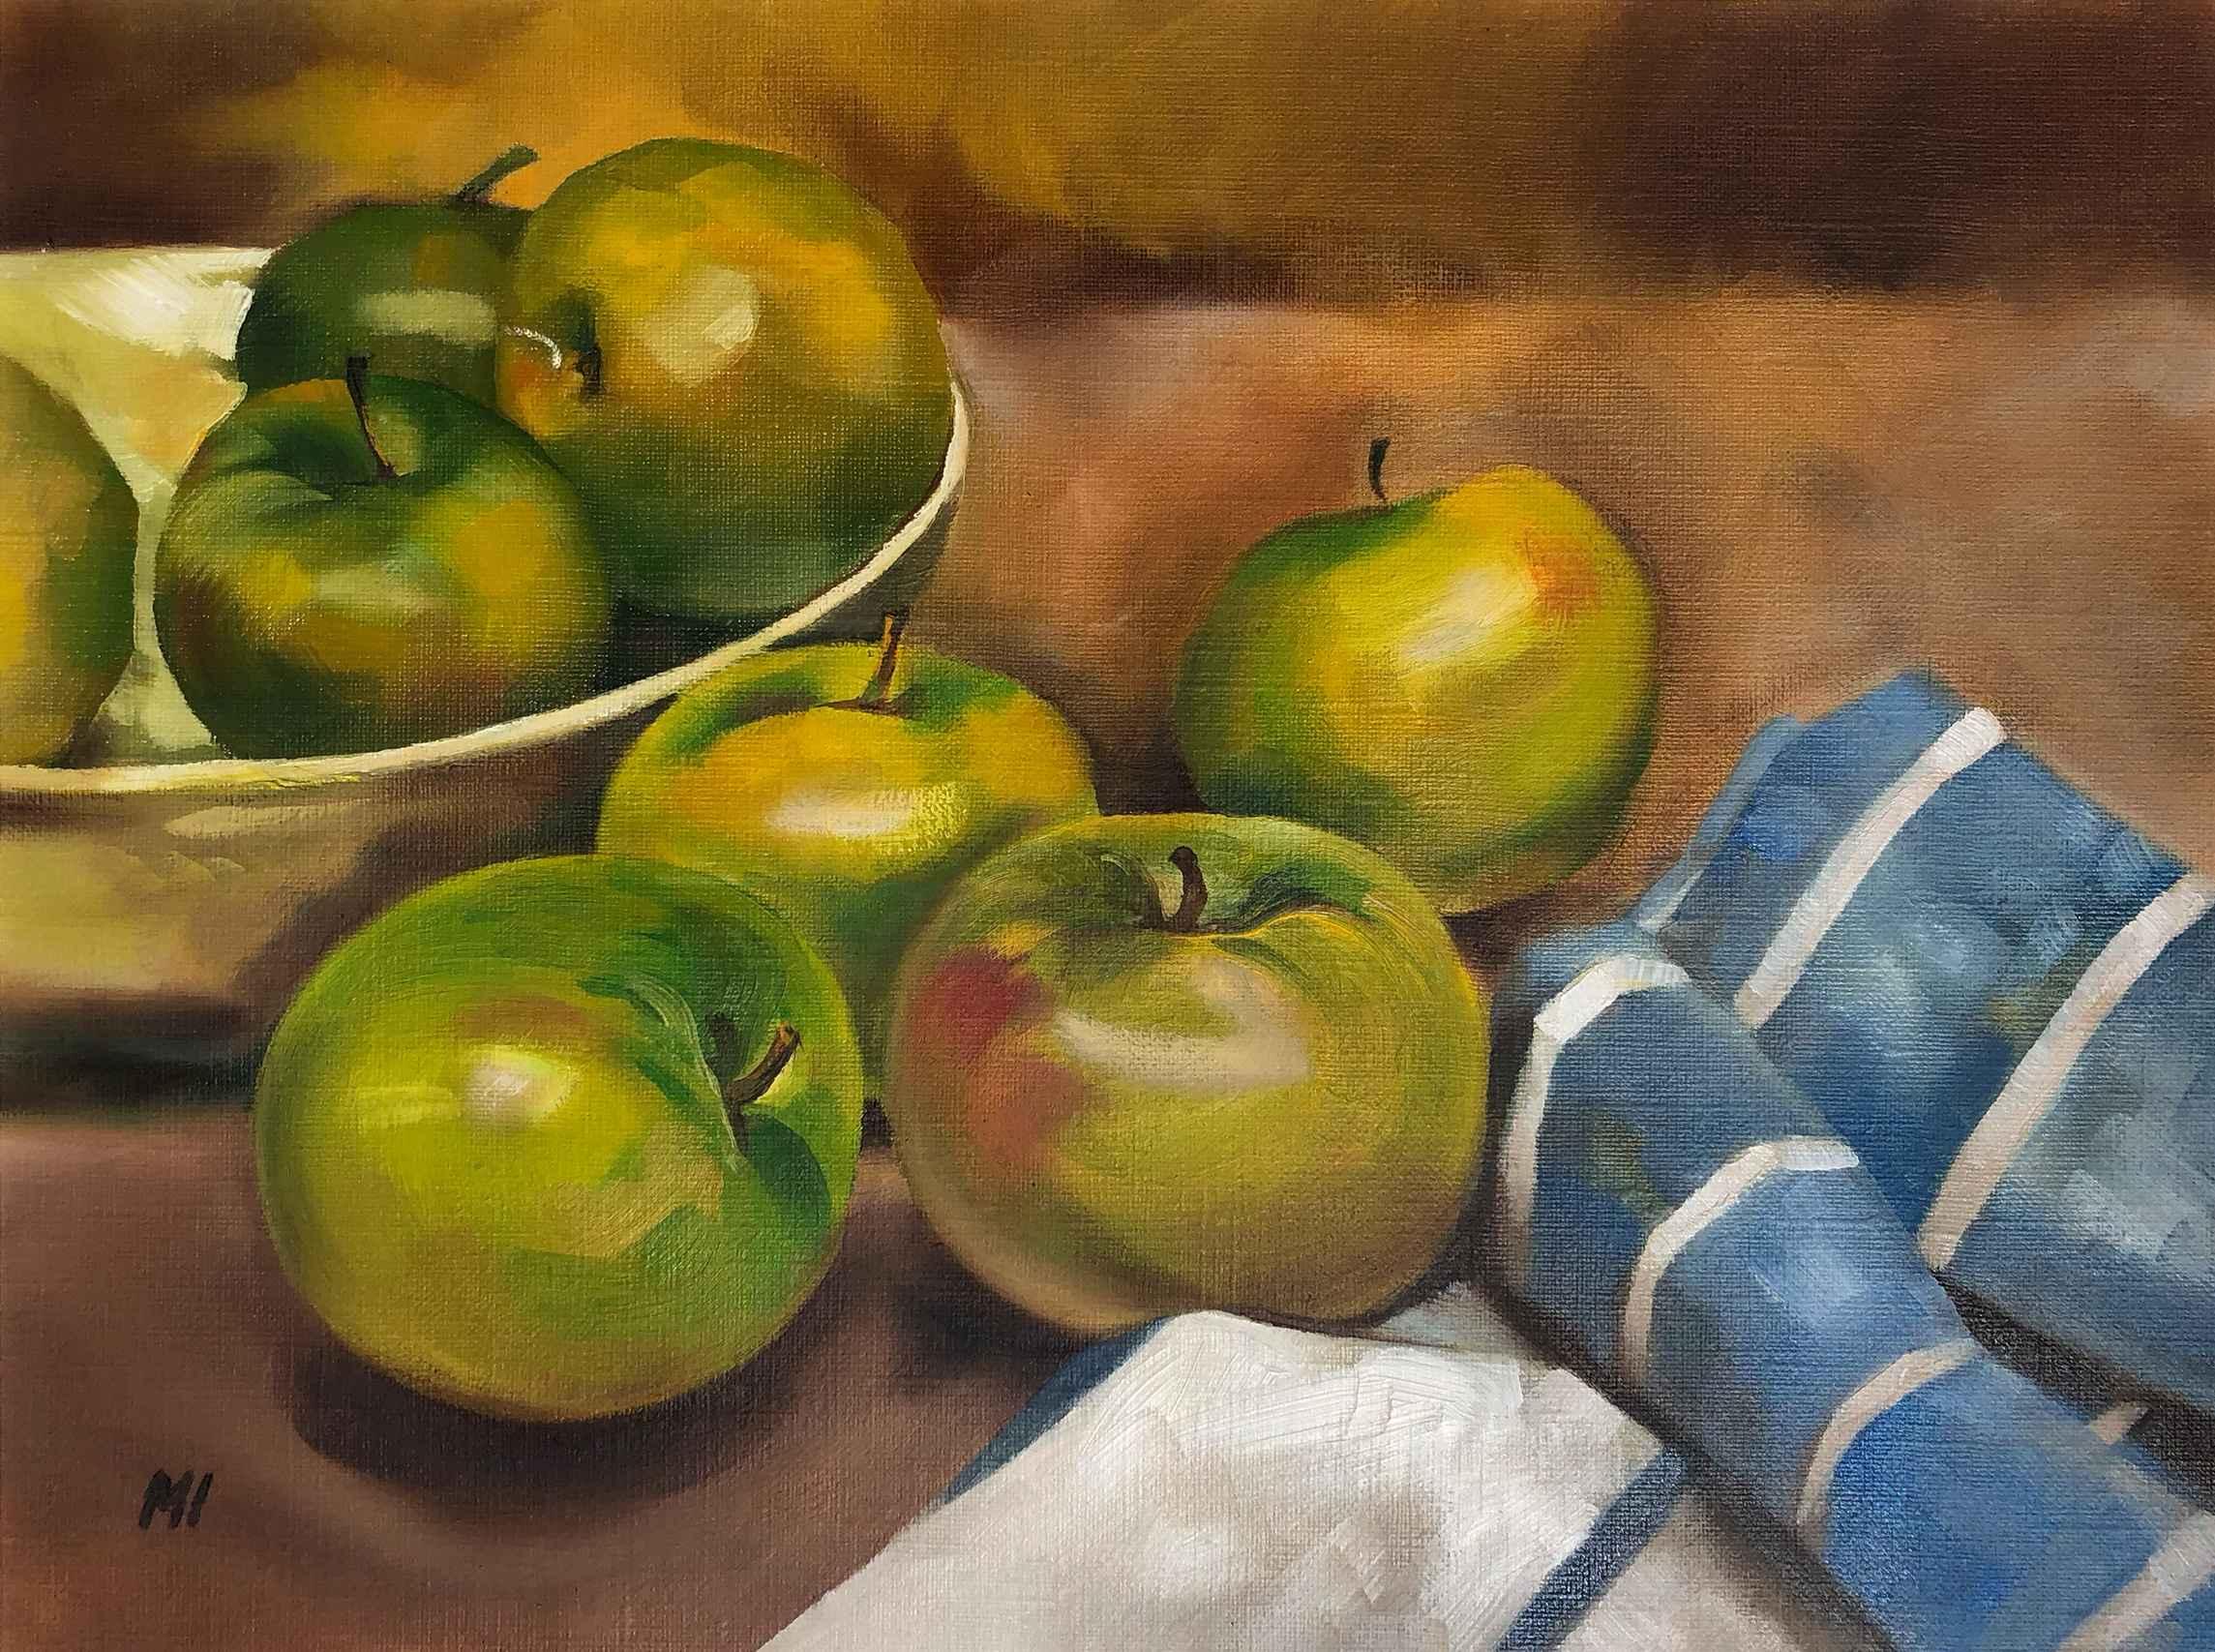 Apples & Linen Towel by  Marina Ivanova - Masterpiece Online